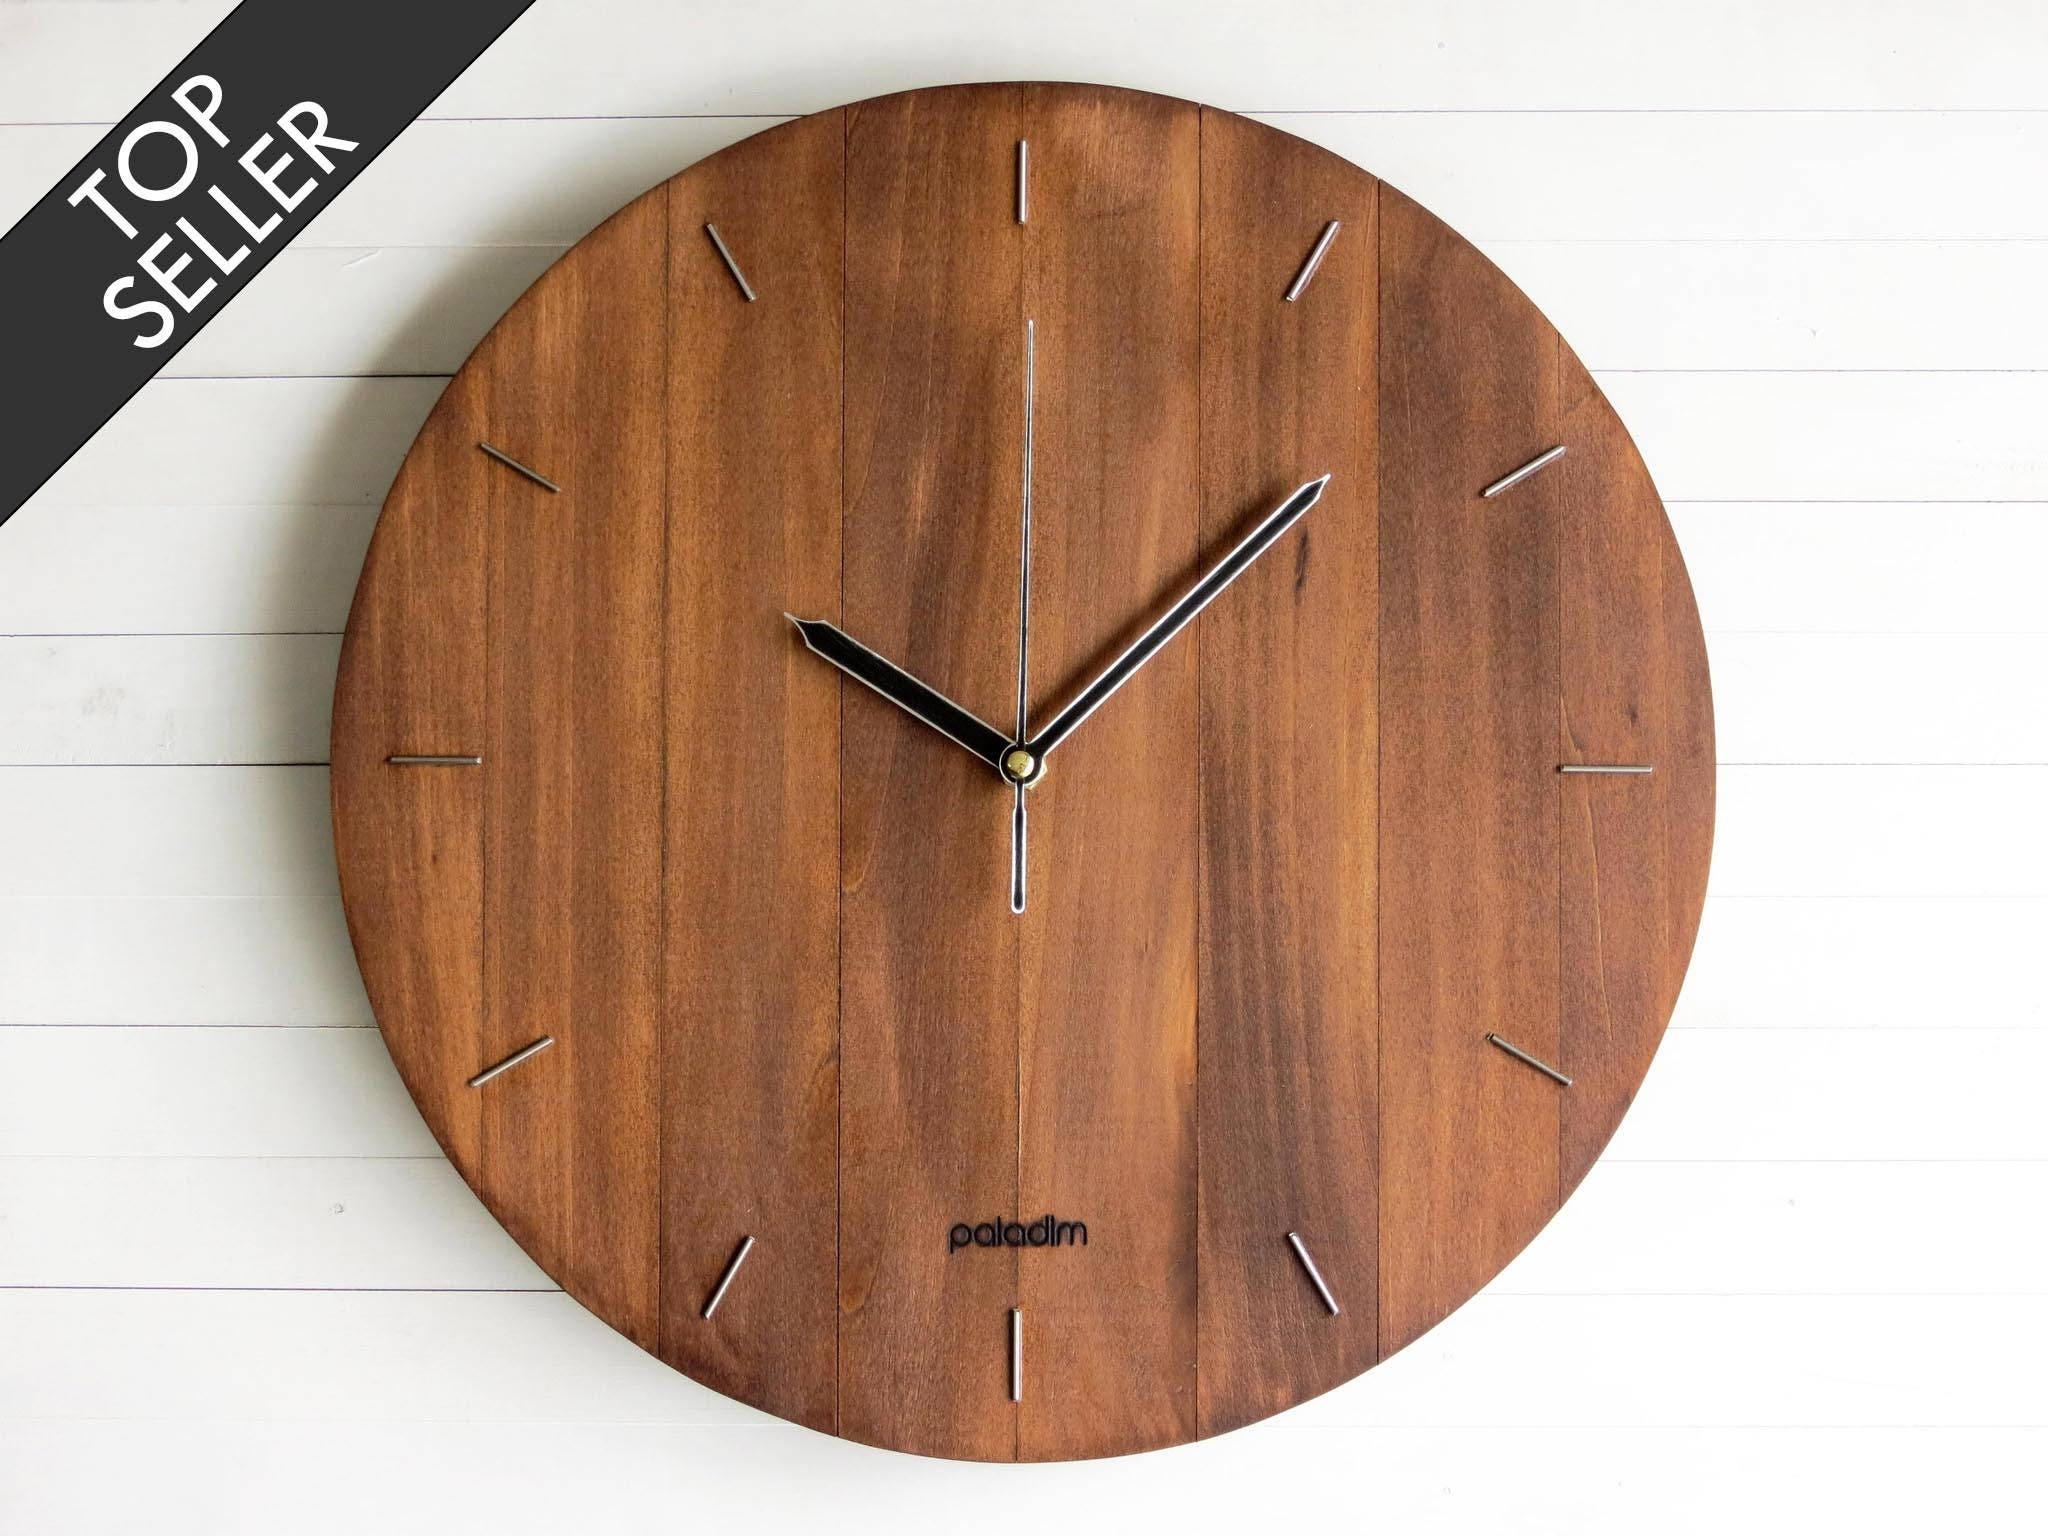 Designer Wall Clocks Online: Wall Clock Steampunk Wall Clock Modern Clock Wooden Wall